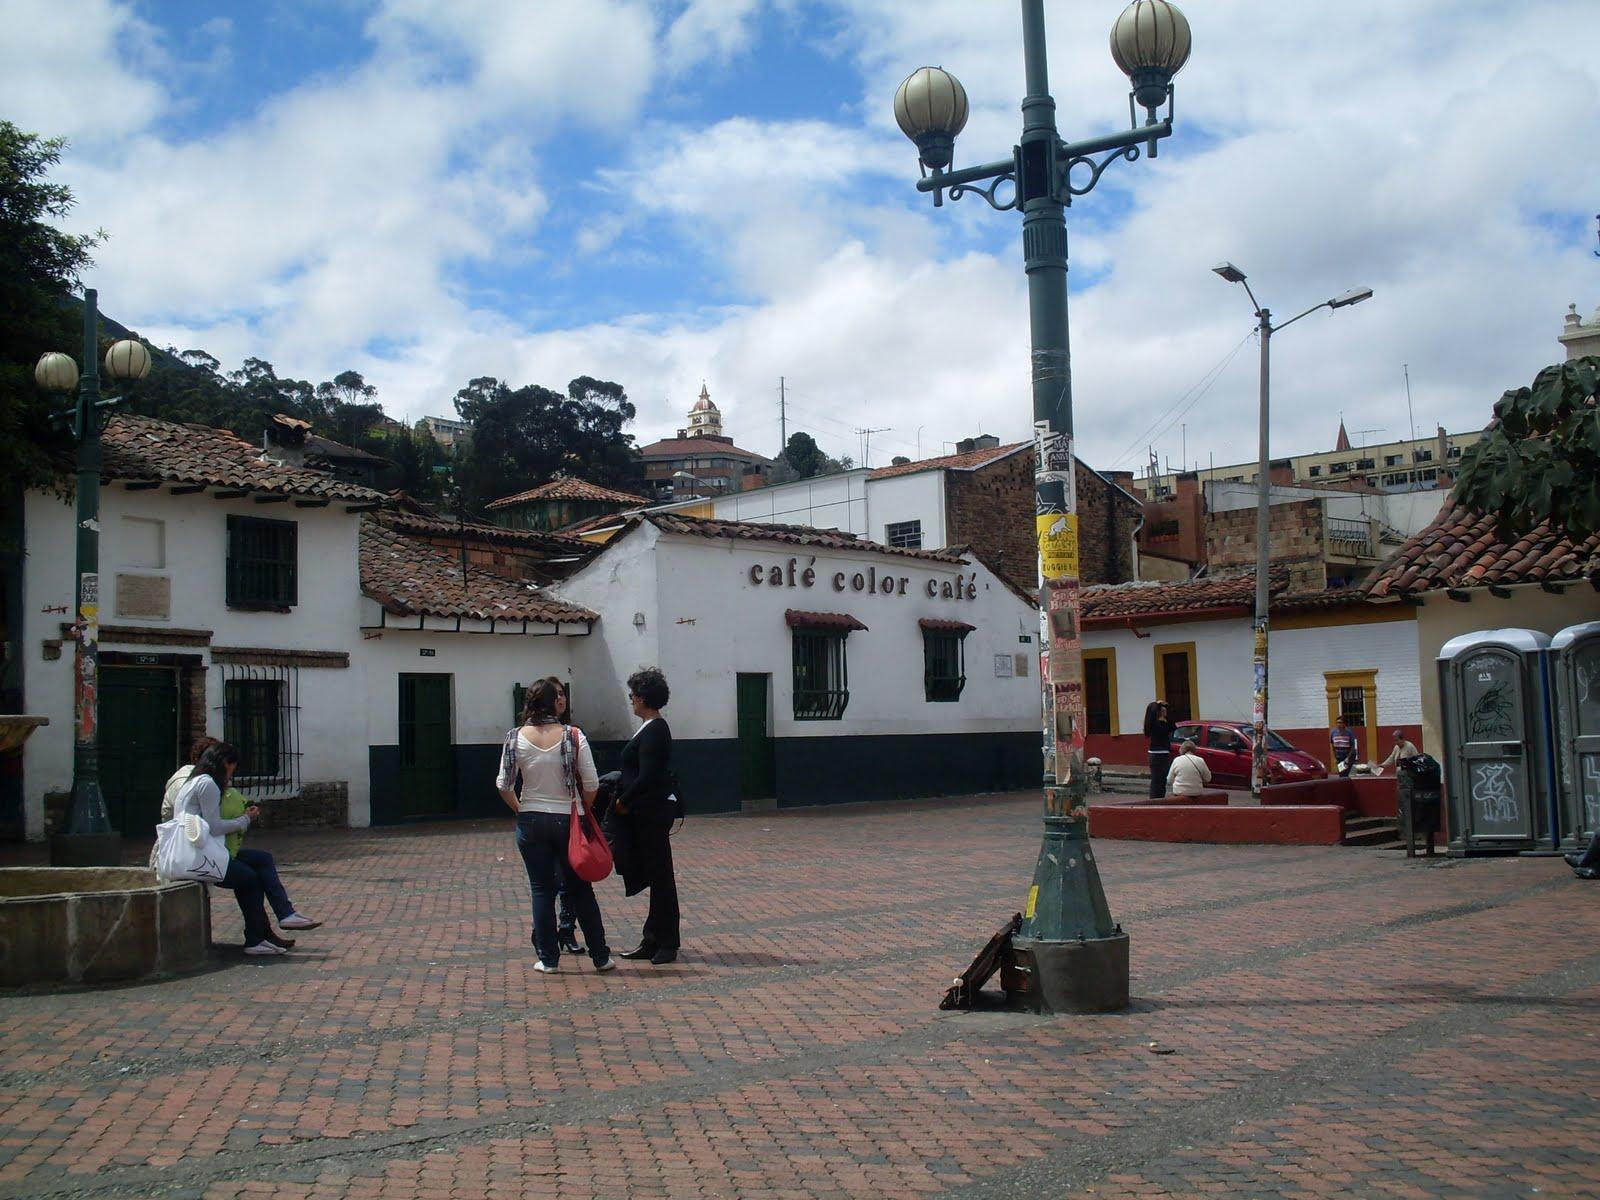 Getting to know bogot plaza del chorro de quevedo - Agencia de viajes diana garzon ...